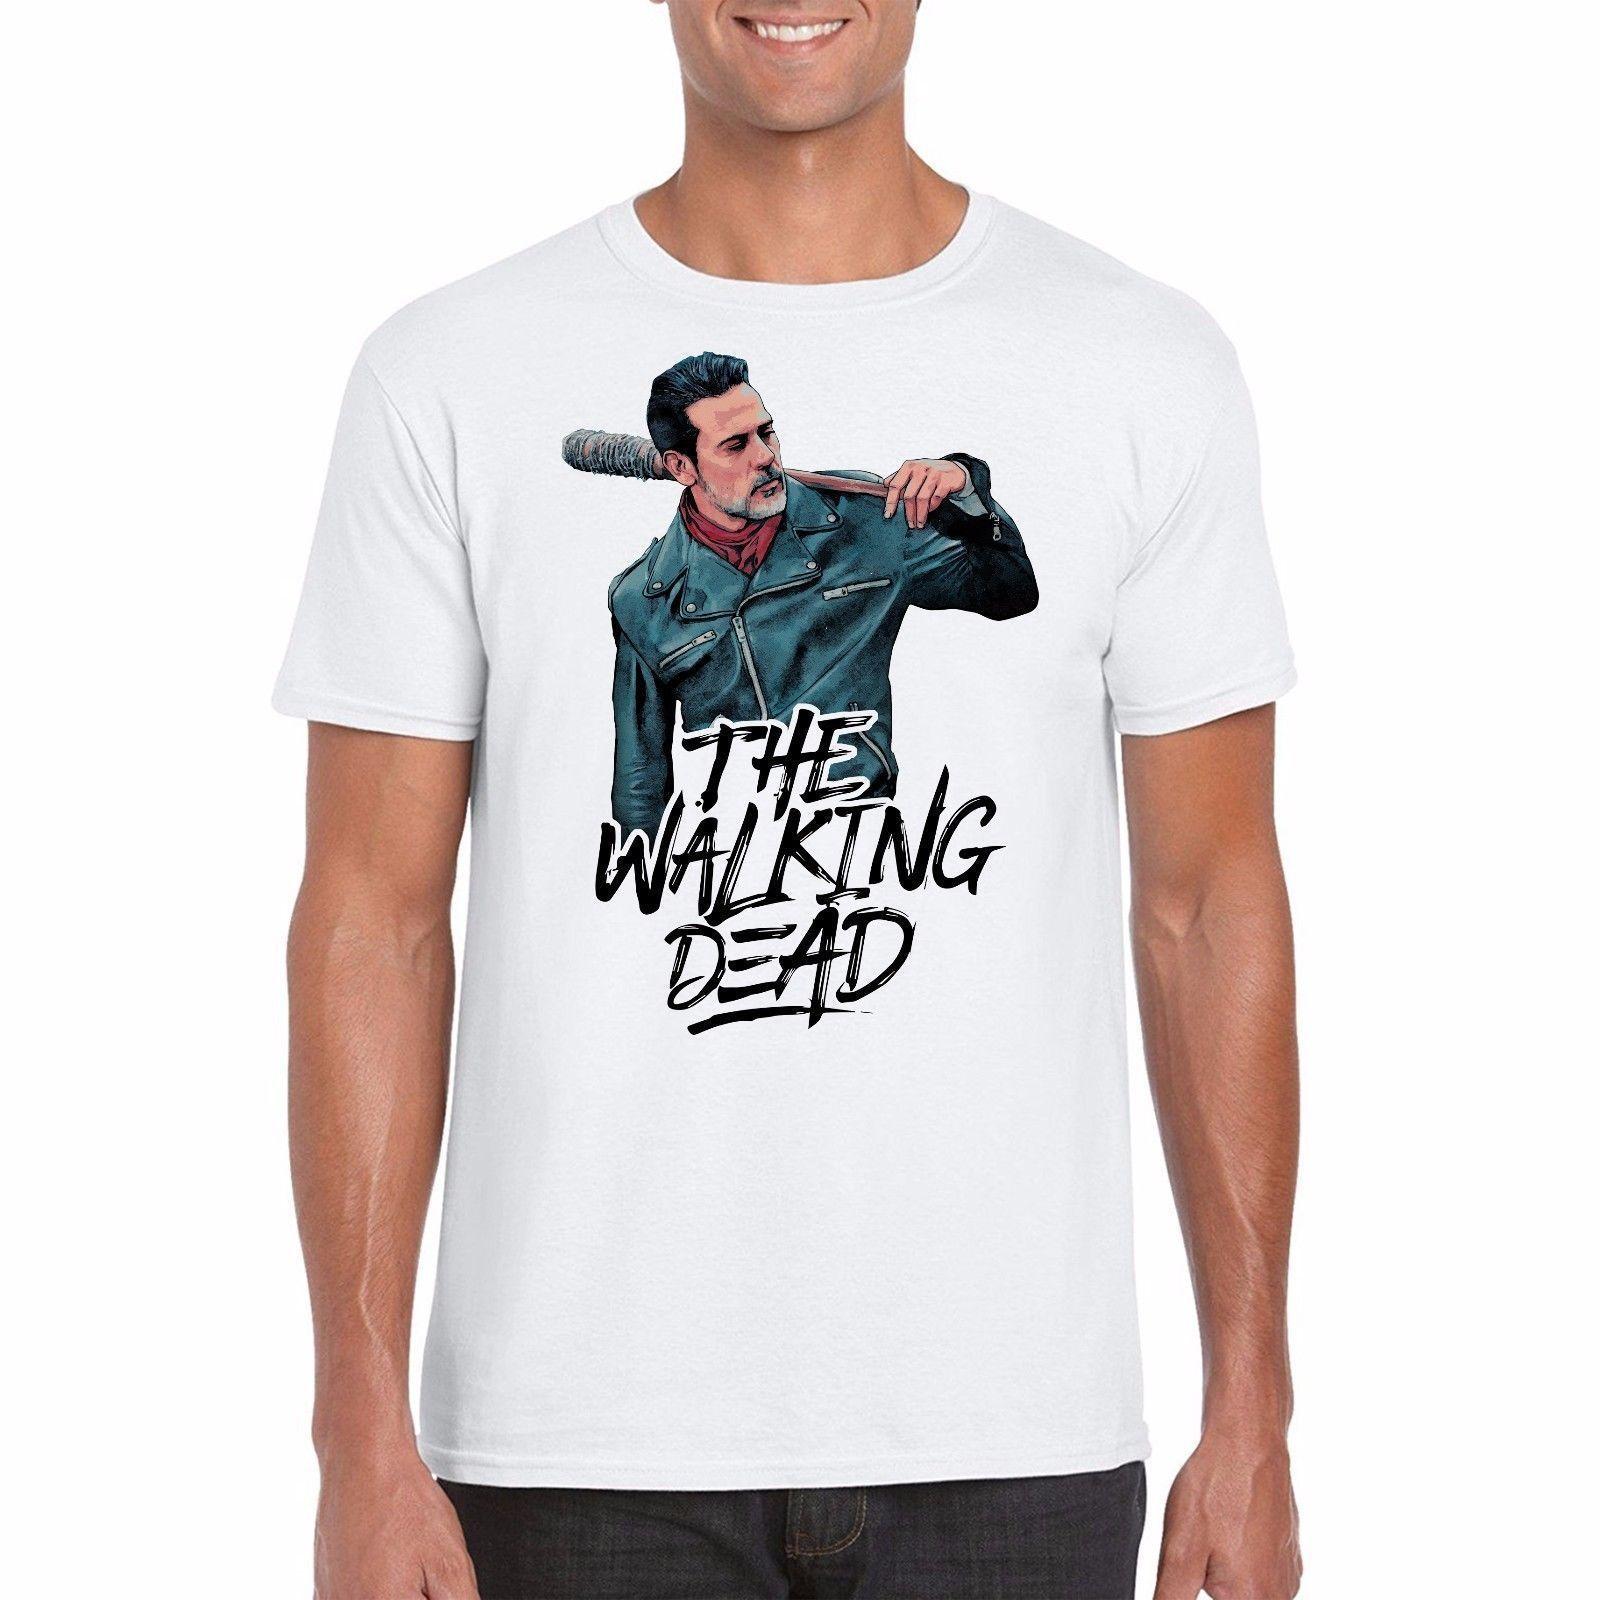 5176f4f29 The Walking Dead T Shirt Negan TV PosterFunny Unisex Tshirt Buy T Shirt  Design Buy Tee From Stylemixxuk, $12.96| DHgate.Com